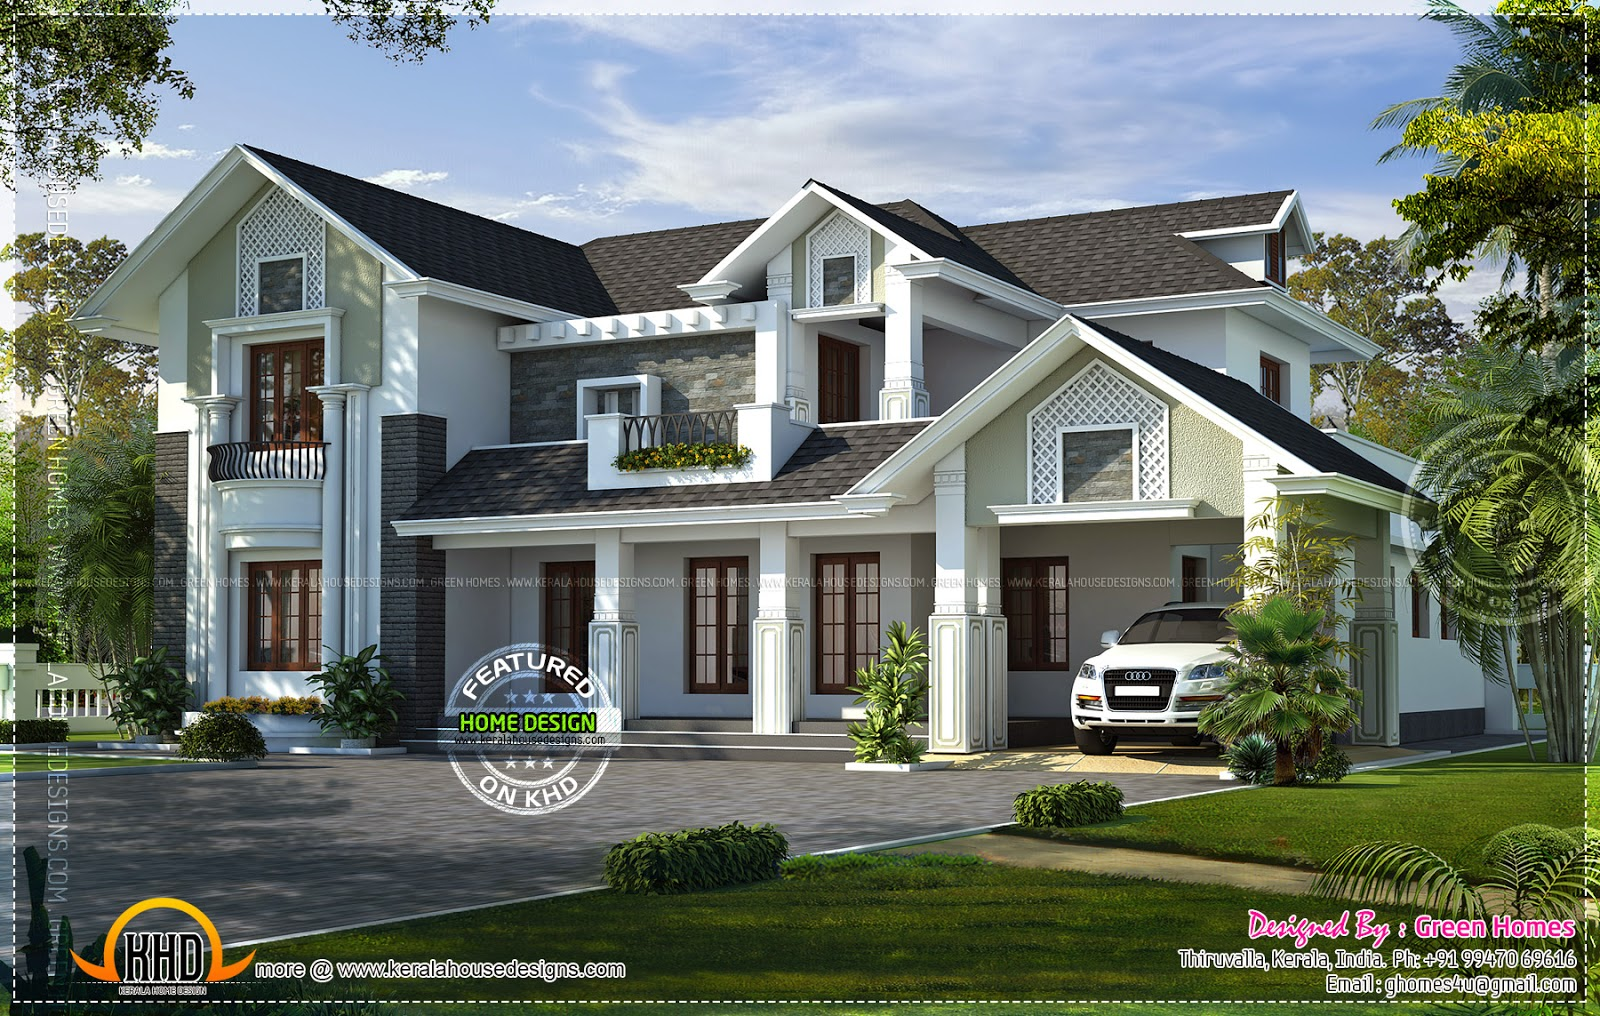 western-style-home.jpg